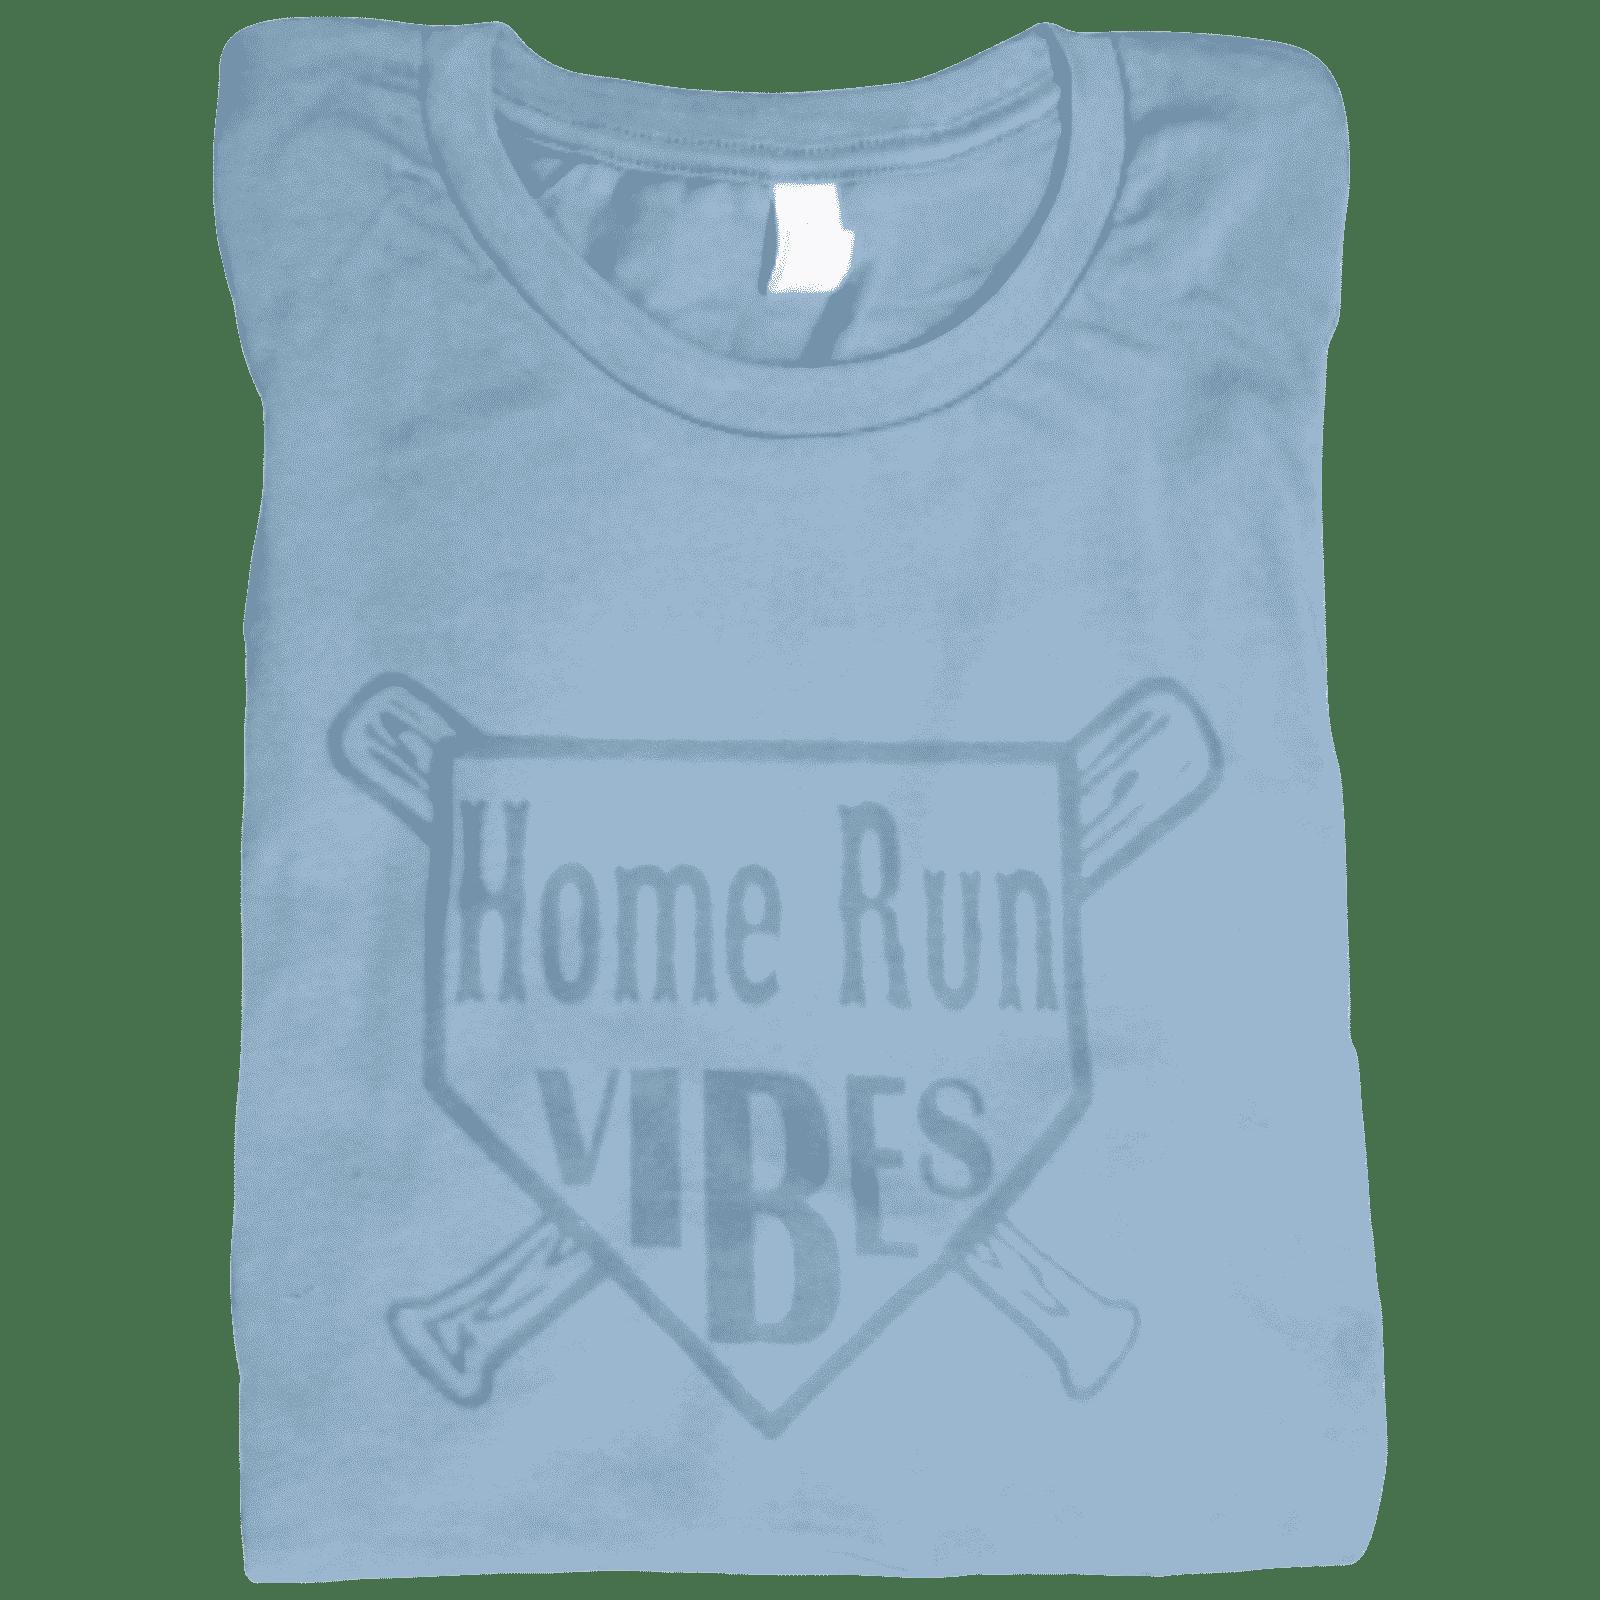 Home Vibes shirt